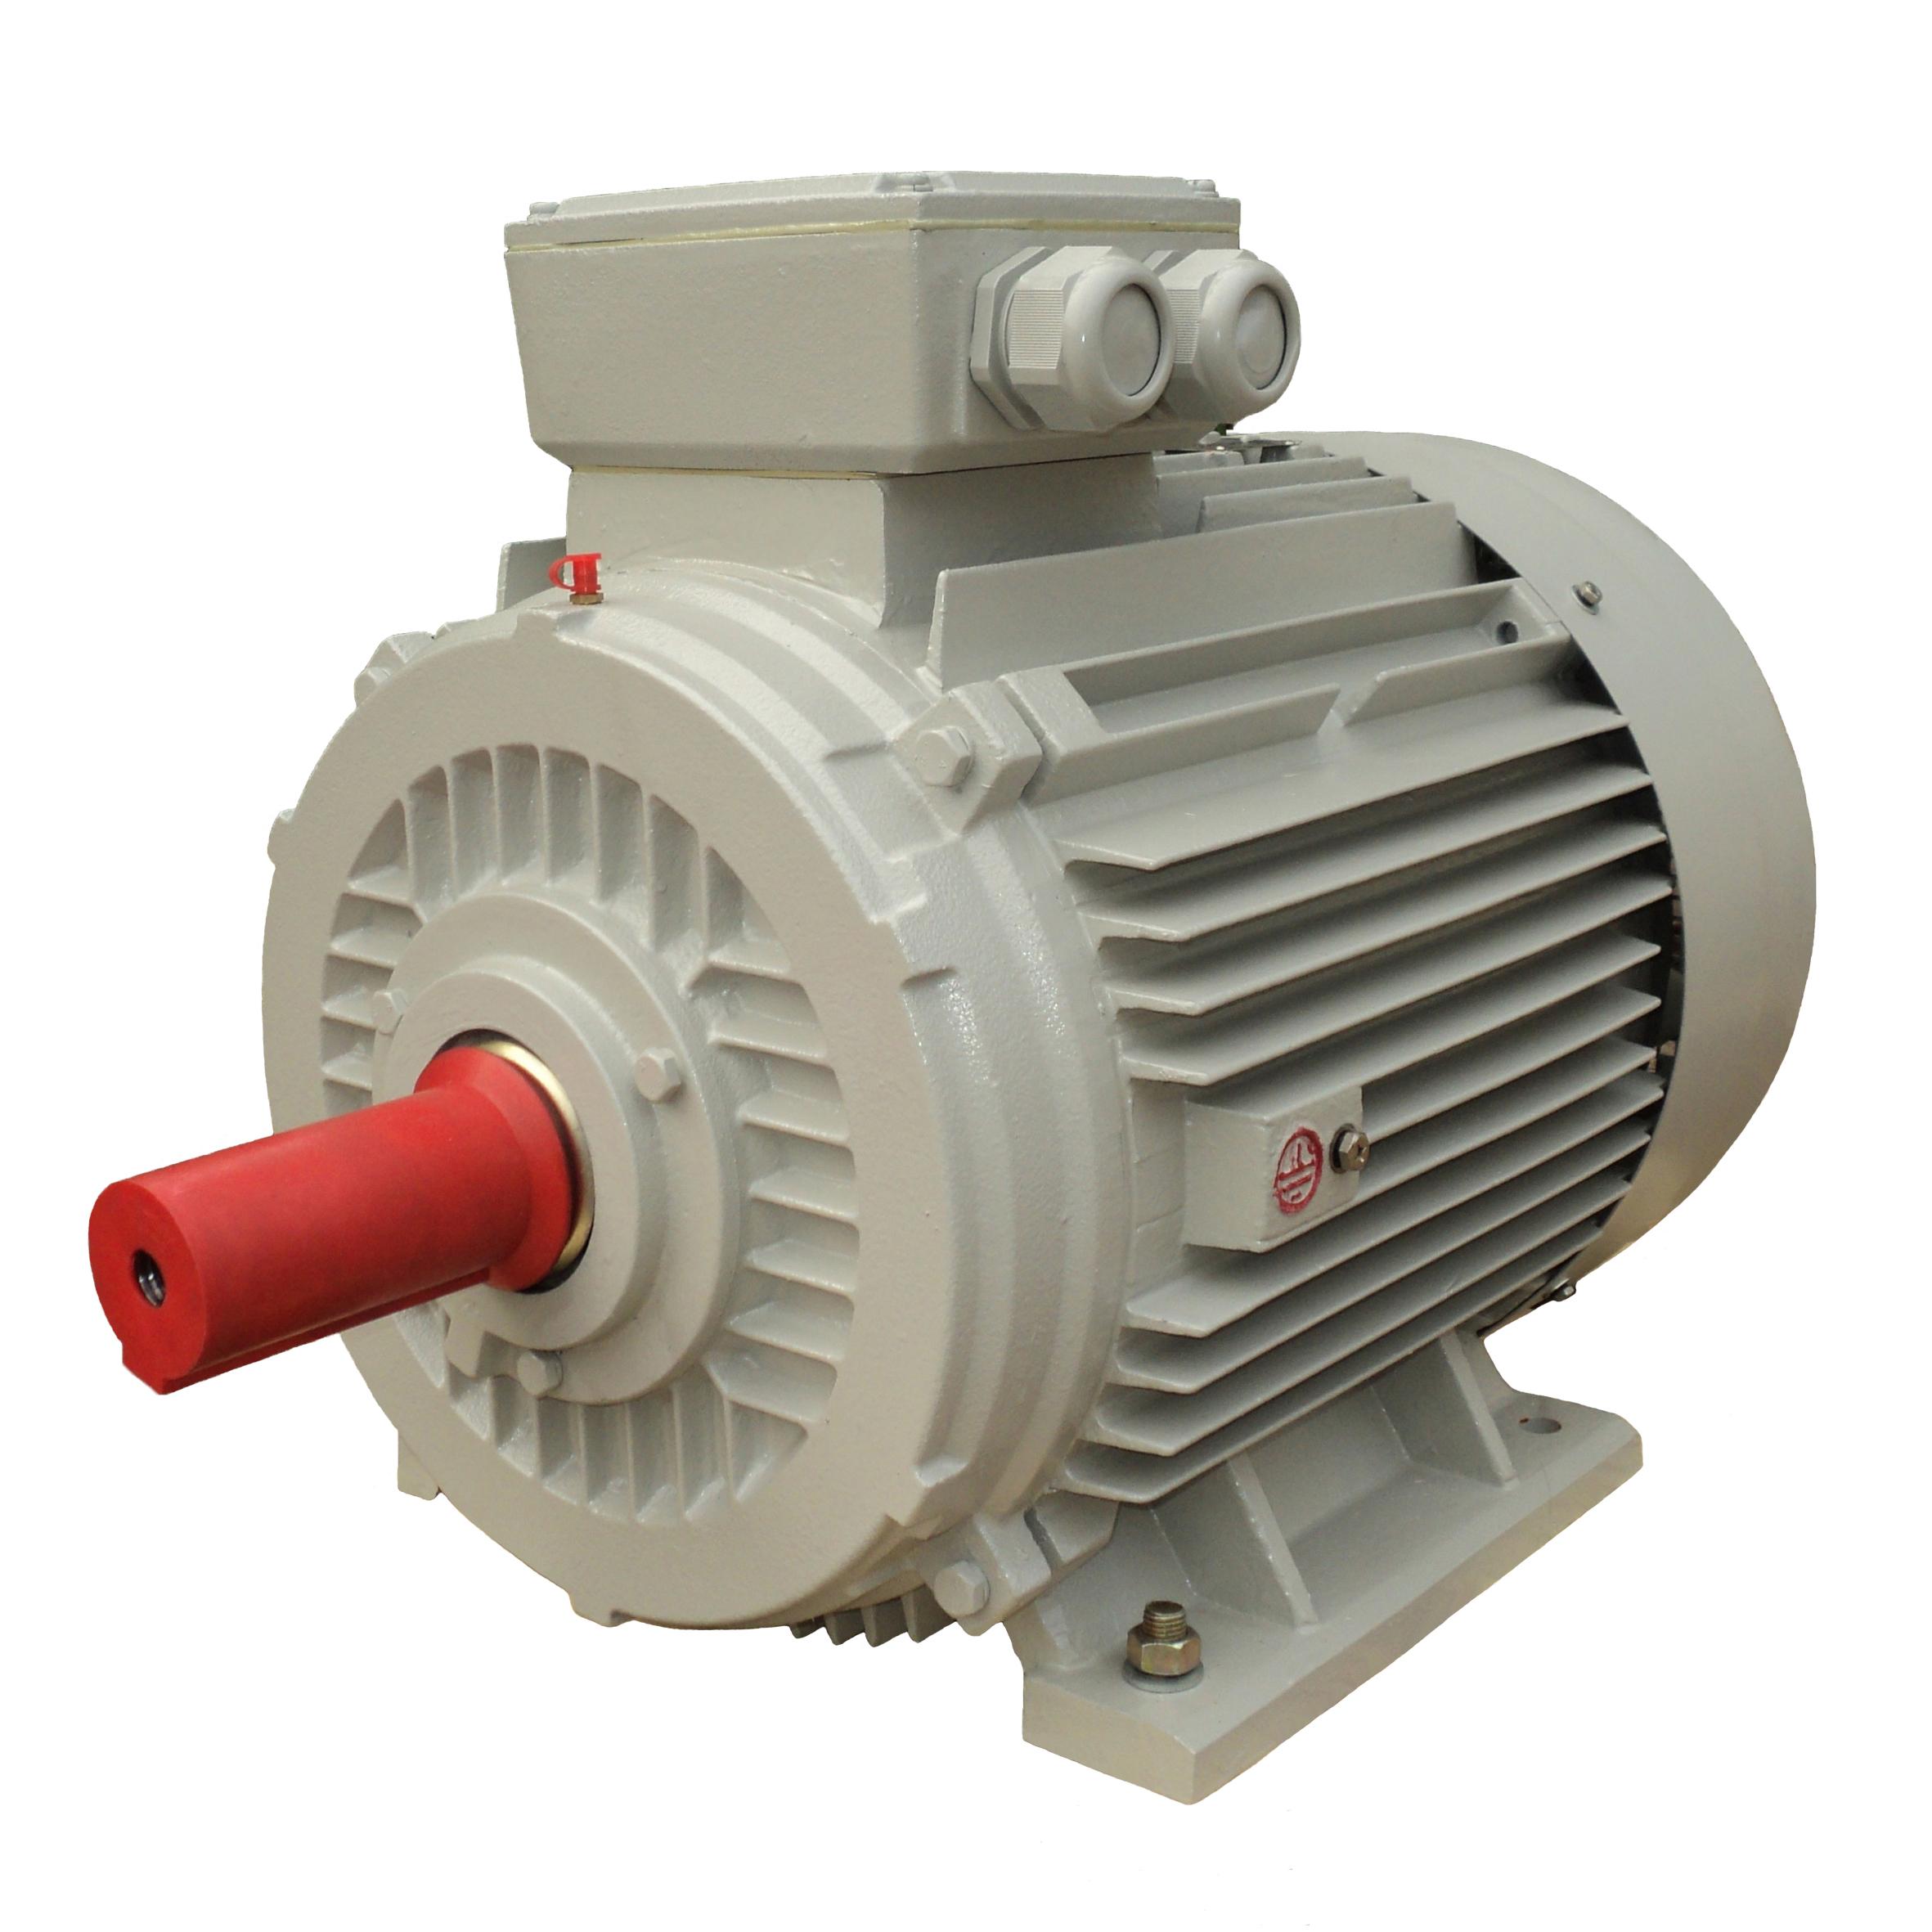 Cung cấp Motor Enertech - Motor IQF Enertech - Giảm tốc Transtecno